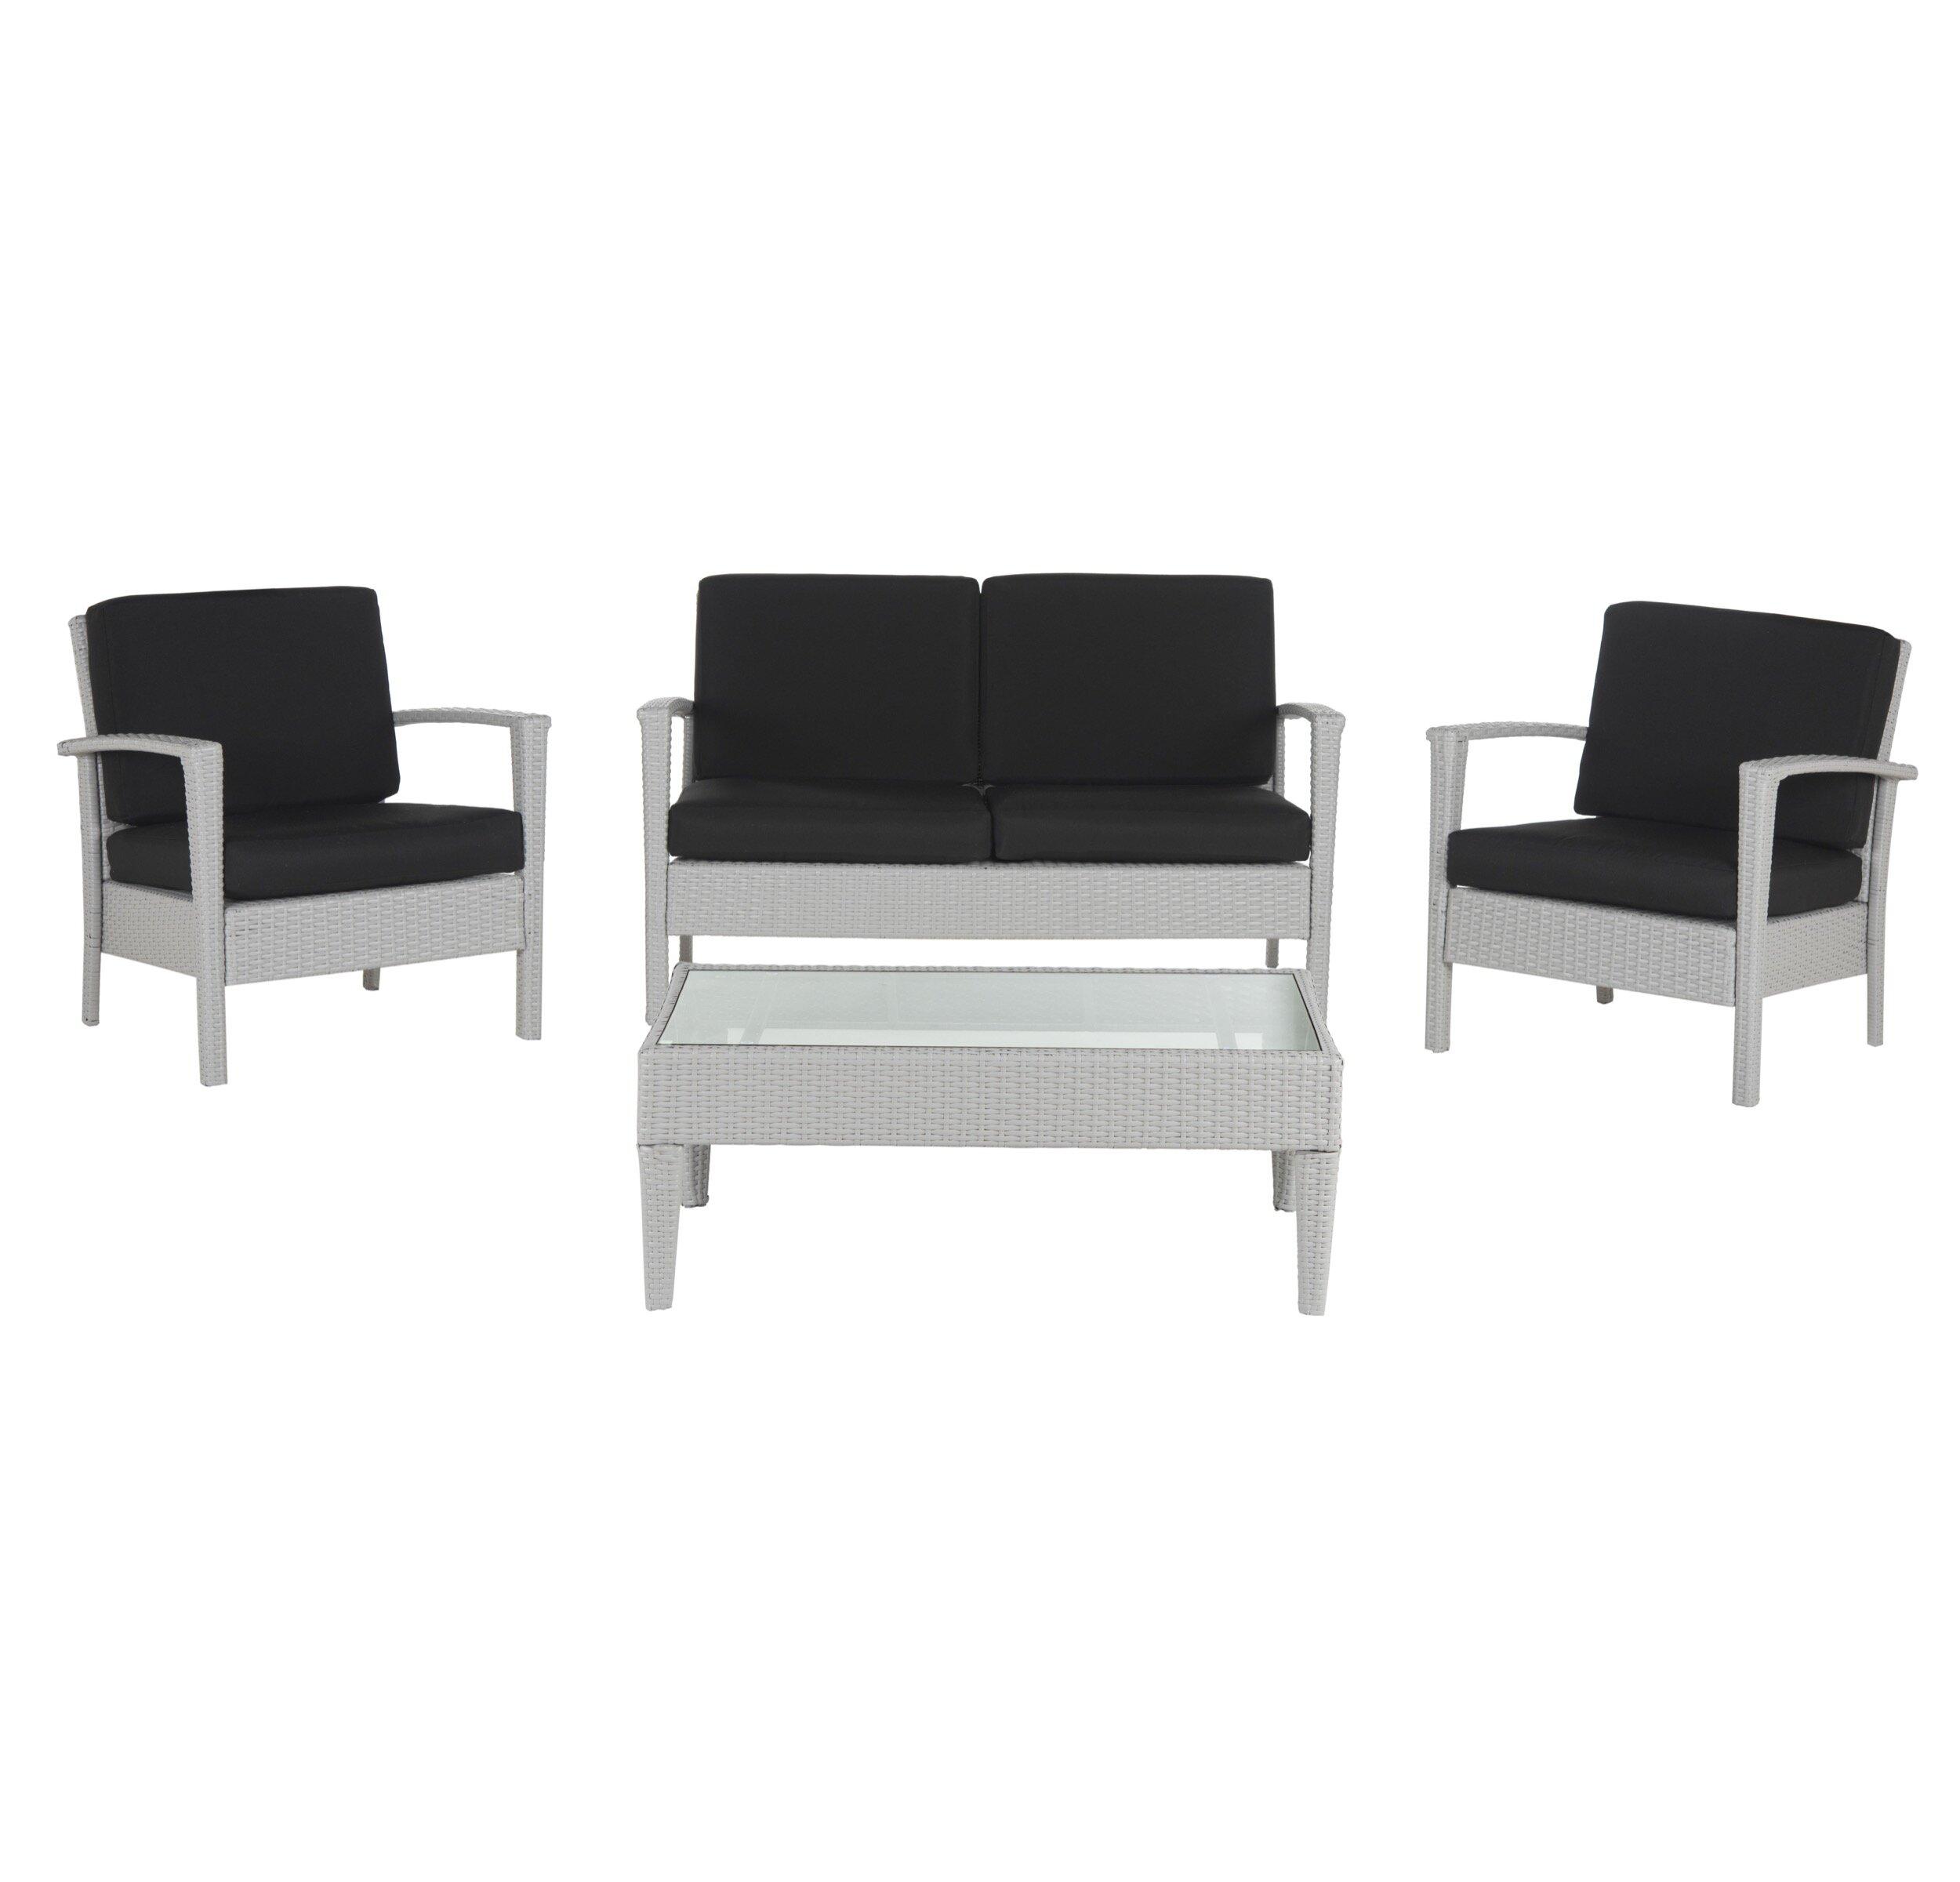 Cade 4 Piece Rattan Sofa Seating Group With Cushion